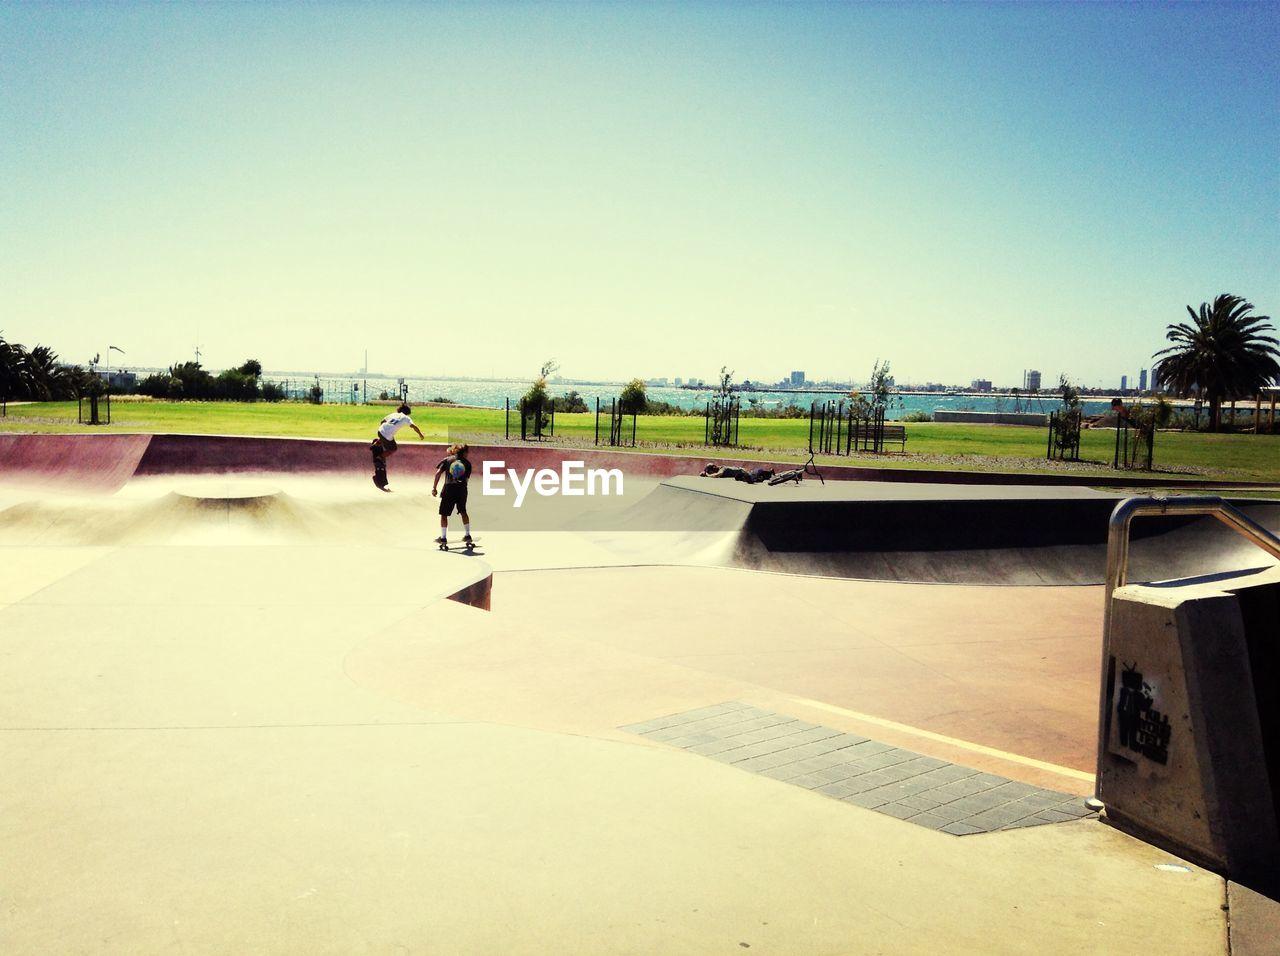 Rear view of two people skateboarding on ramp